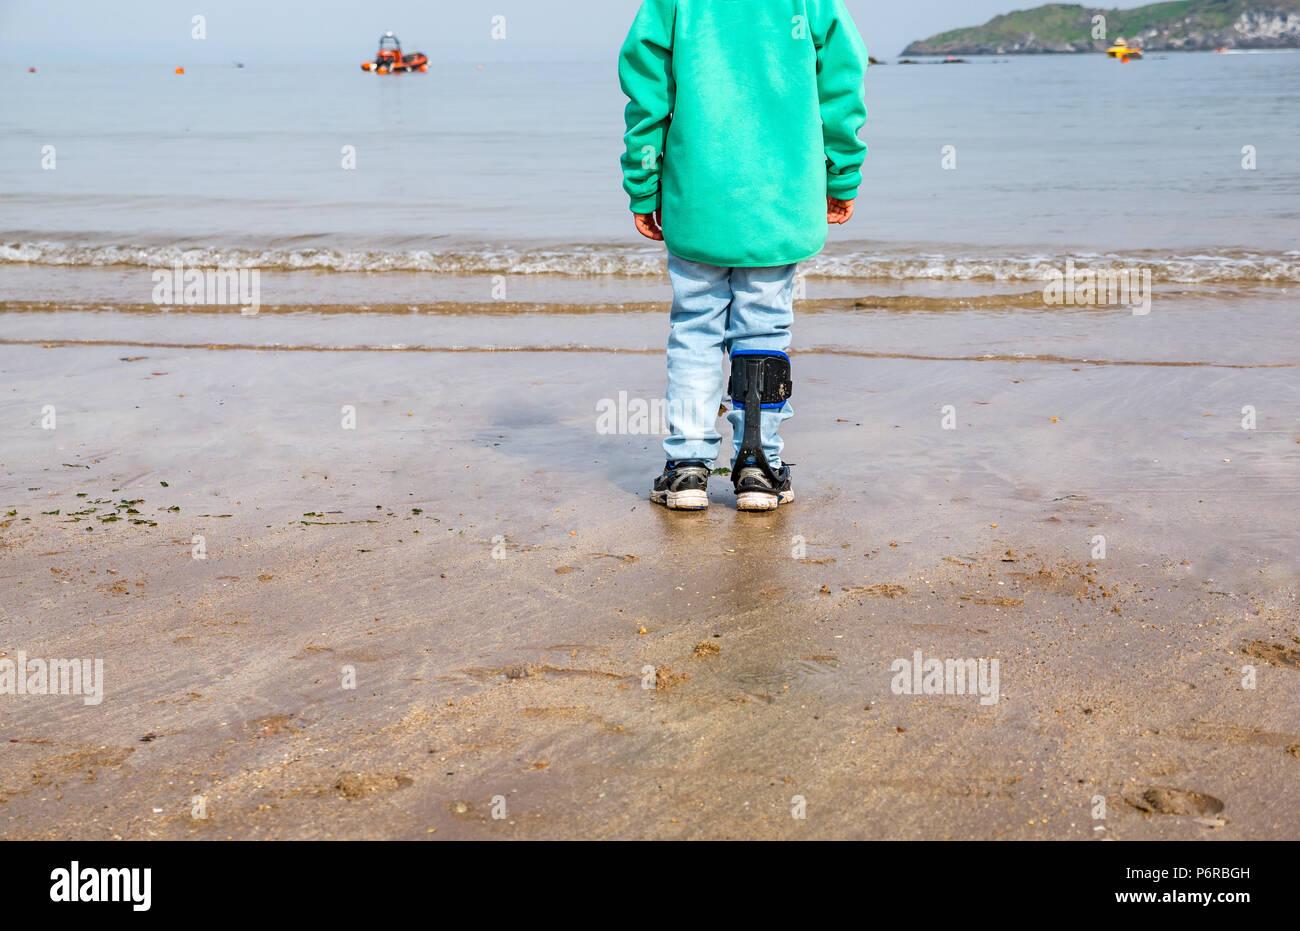 Boy with right hemiplegia wearing carbon fibre turbo drop leg brace on West beach, North Berwick, East Lothian, Scotland, UK - Stock Image